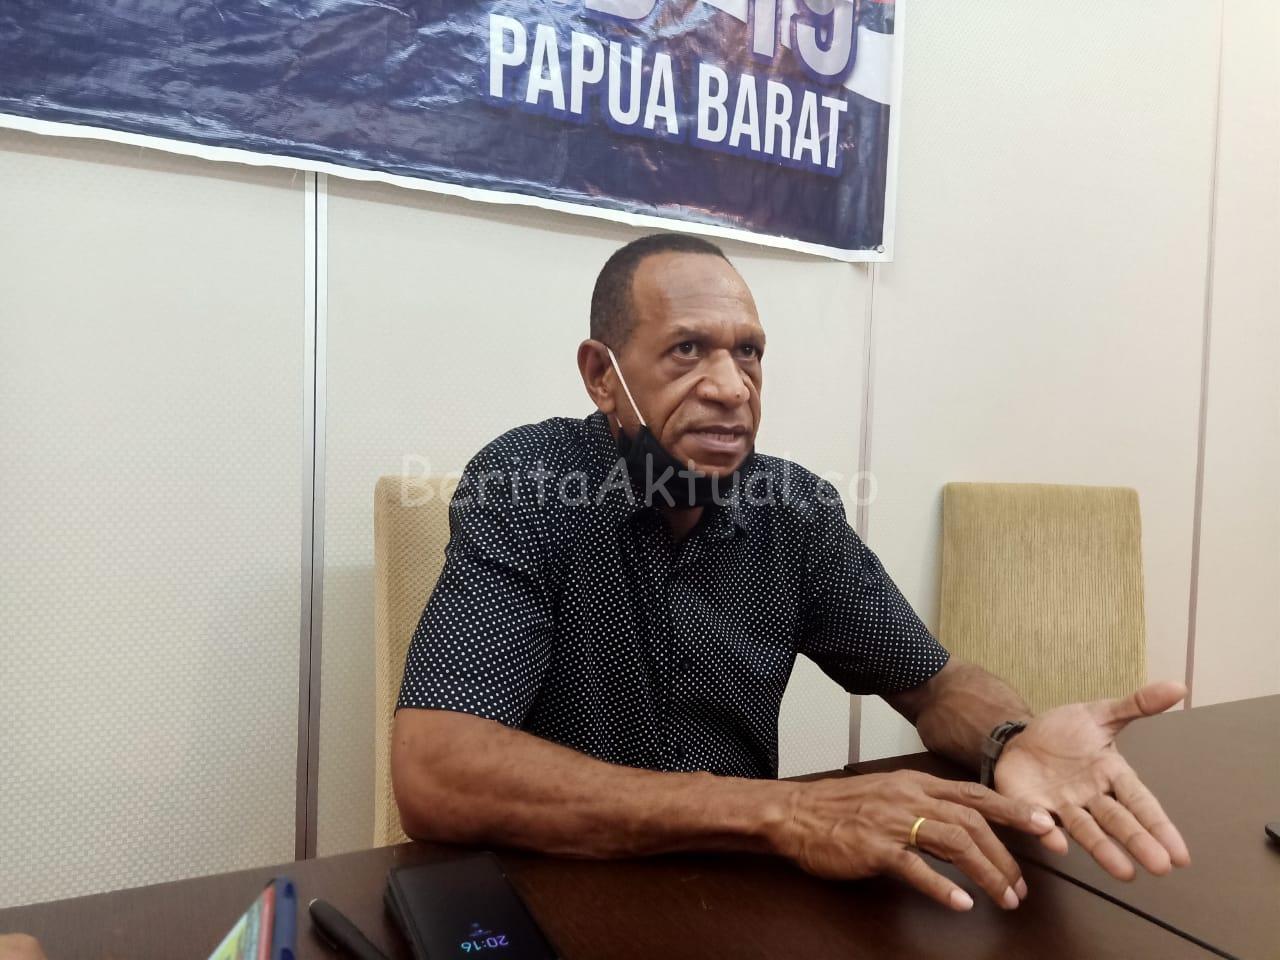 Tambah 5 Orang Positif Dari Bintuni, Kini Papua Barat Jumlah 42 1 IMG 20200501 WA0065